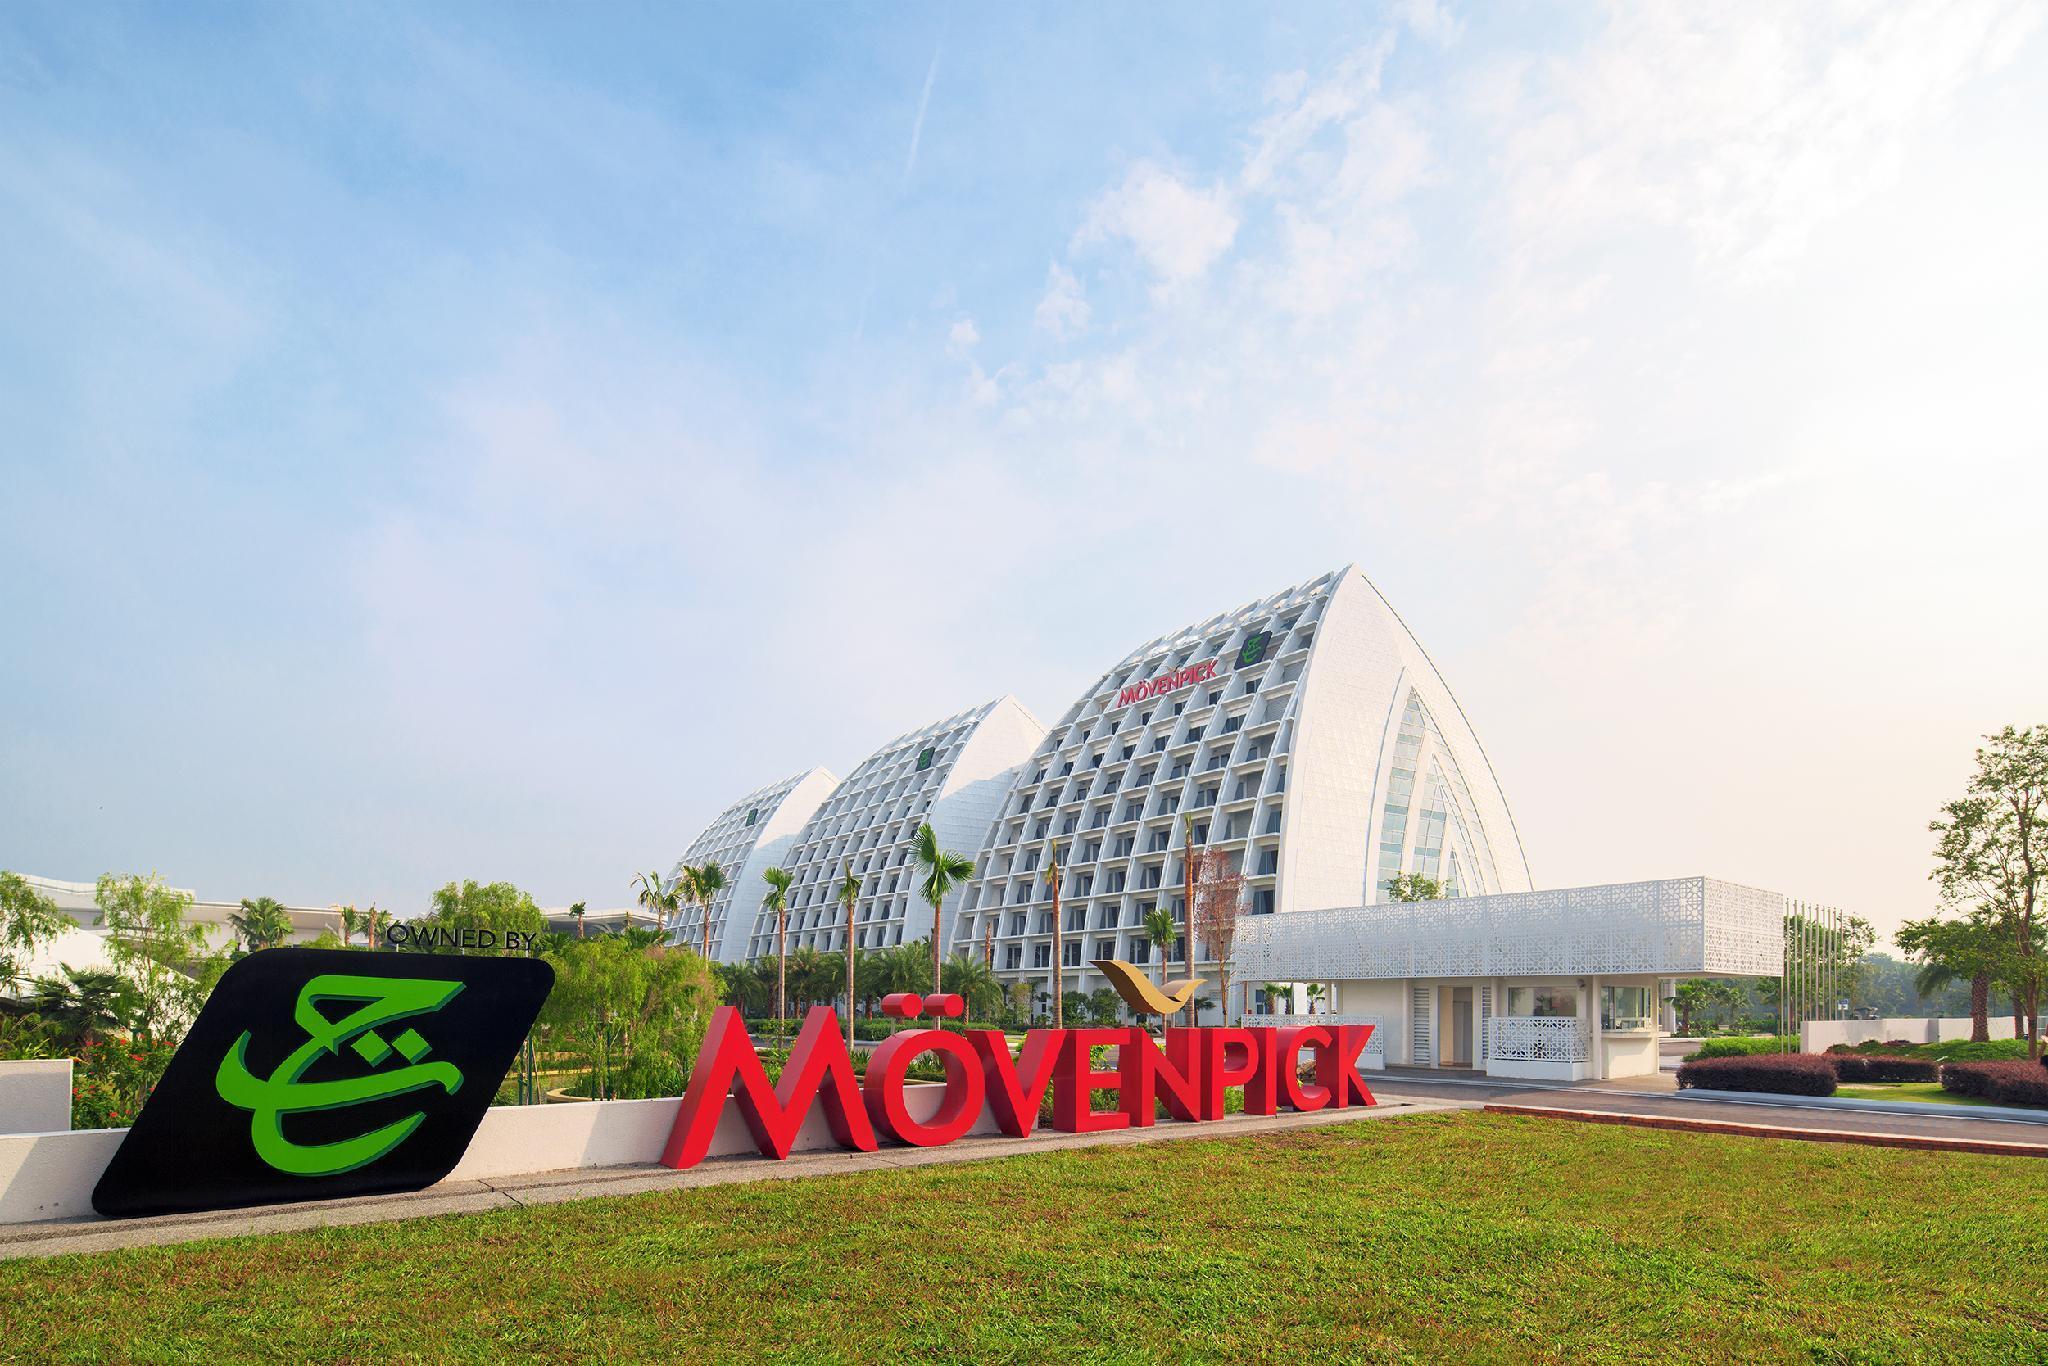 Movenpick Hotel And Convention Centre KLIA, Kuala Lumpur